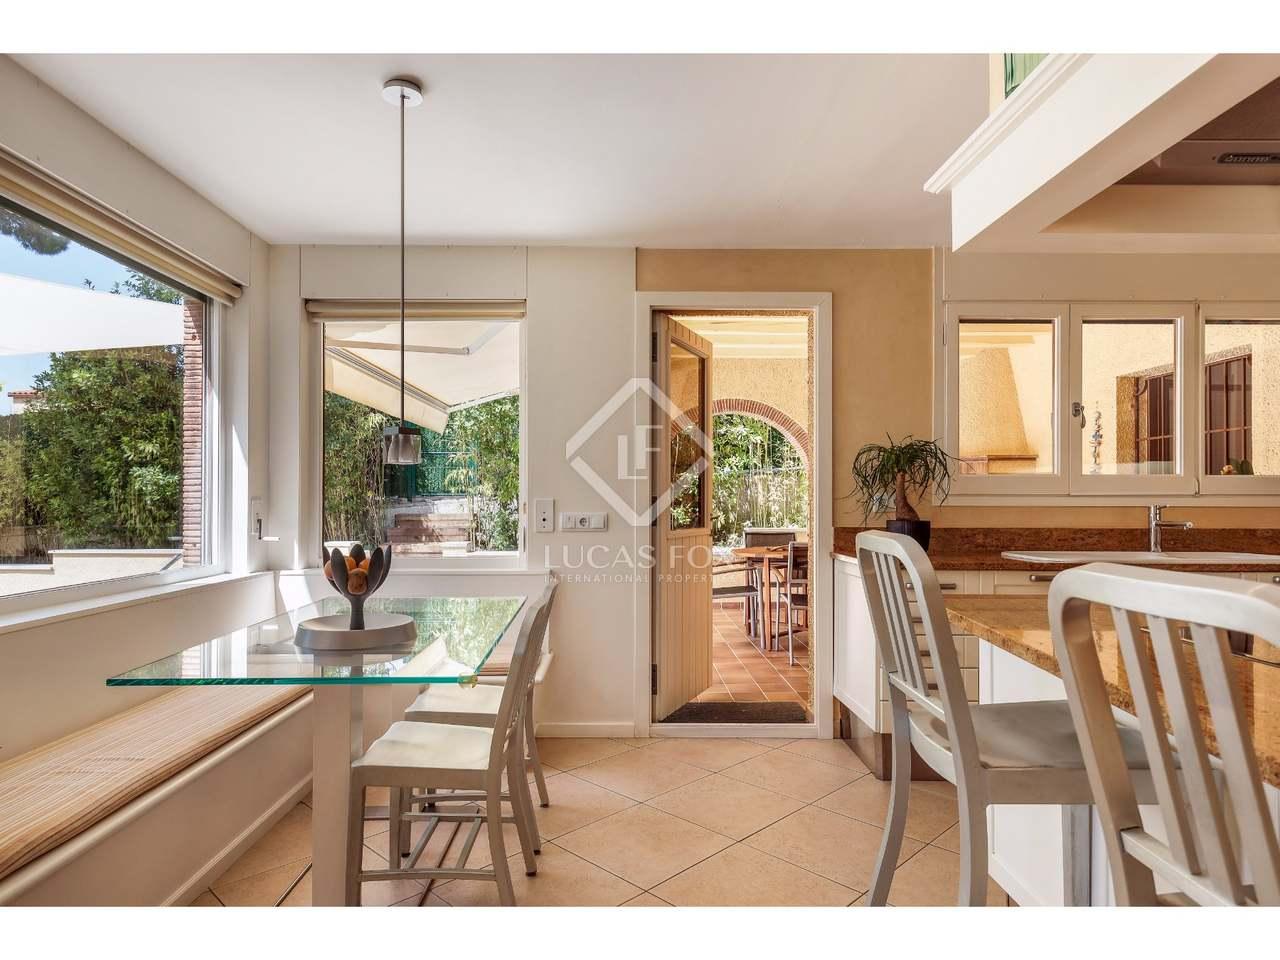 Casa de 240m en venta en sant feliu de gu xols - Casas en sant feliu de guixols ...